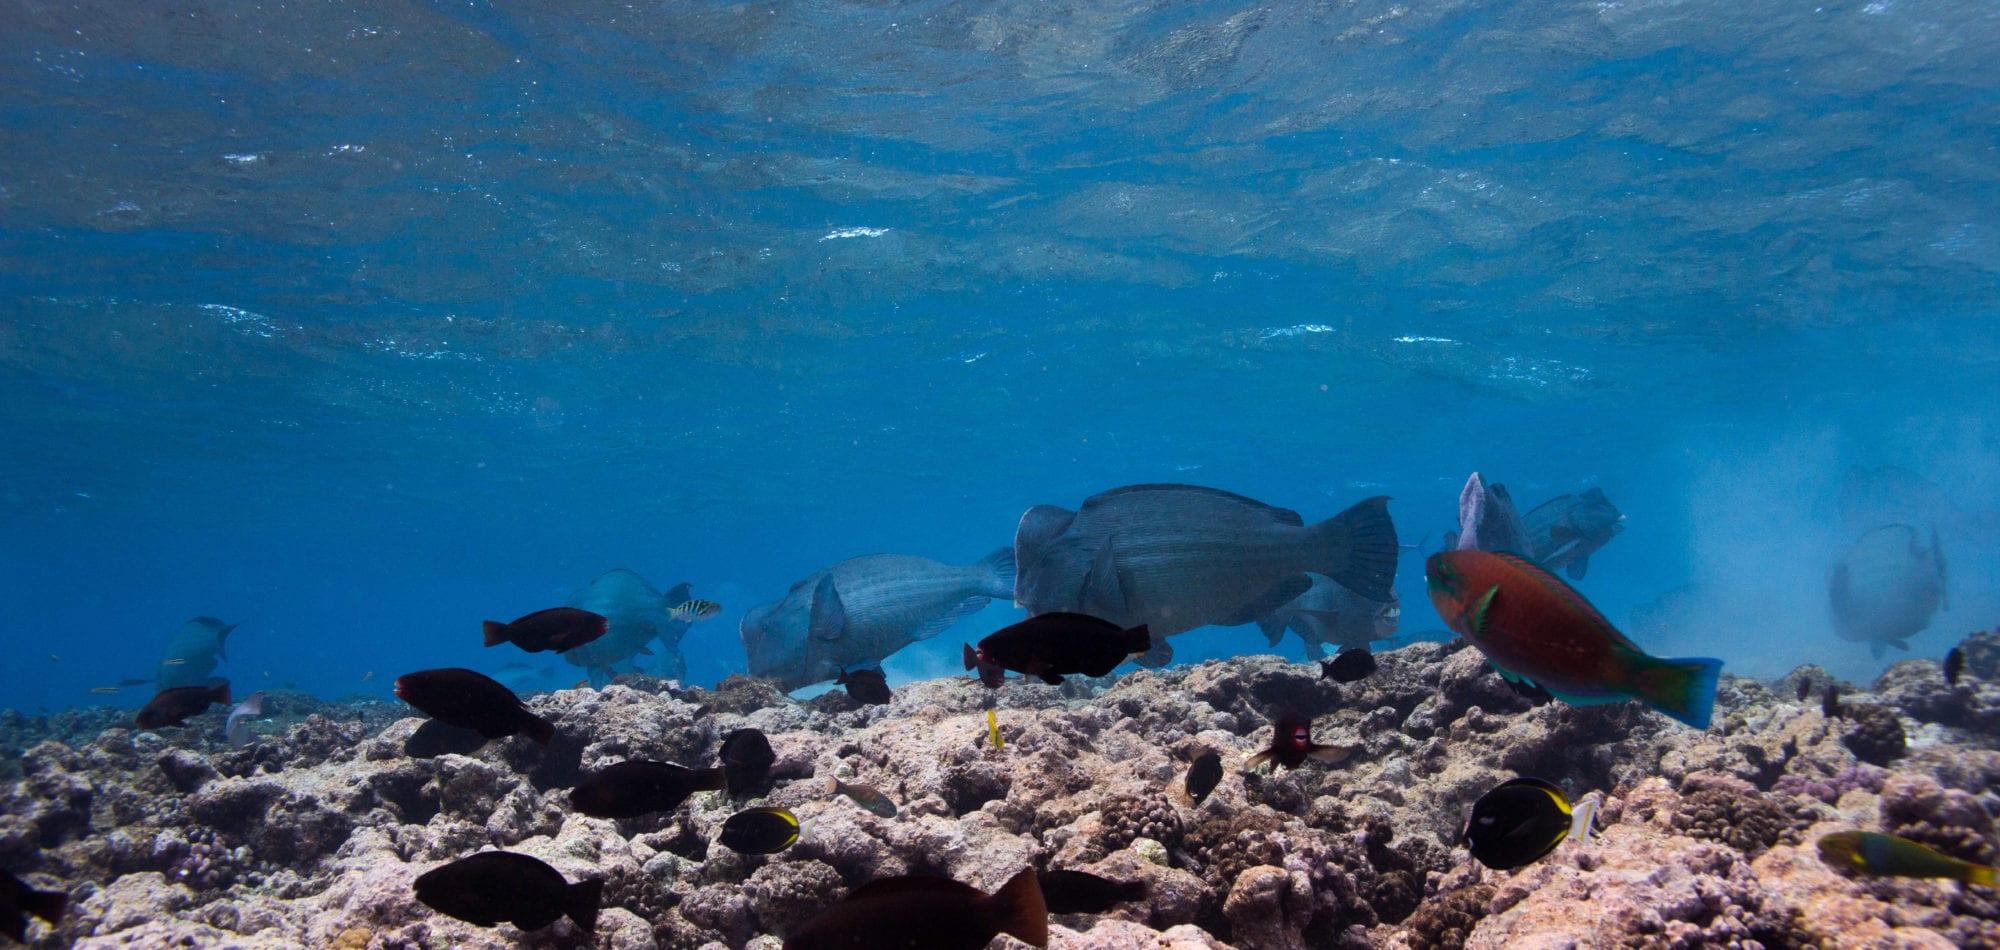 Scuba diving trips in Australia with Dive In Australia - bumphead parrot fish